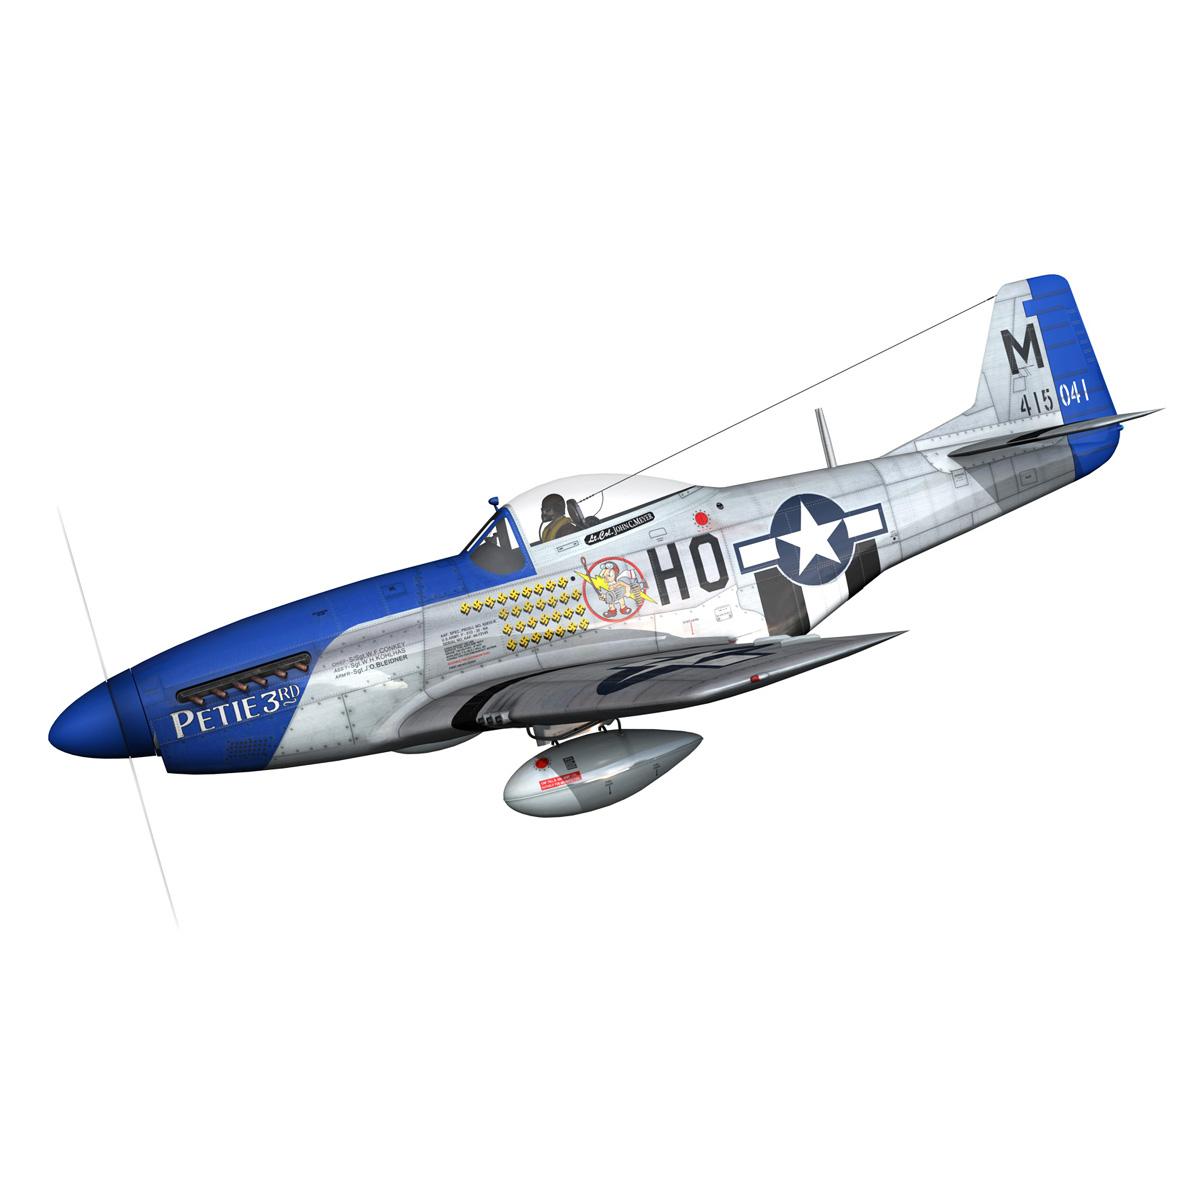 north american p-51d mustang – petie 3rd 3d model fbx c4d lwo obj 280128